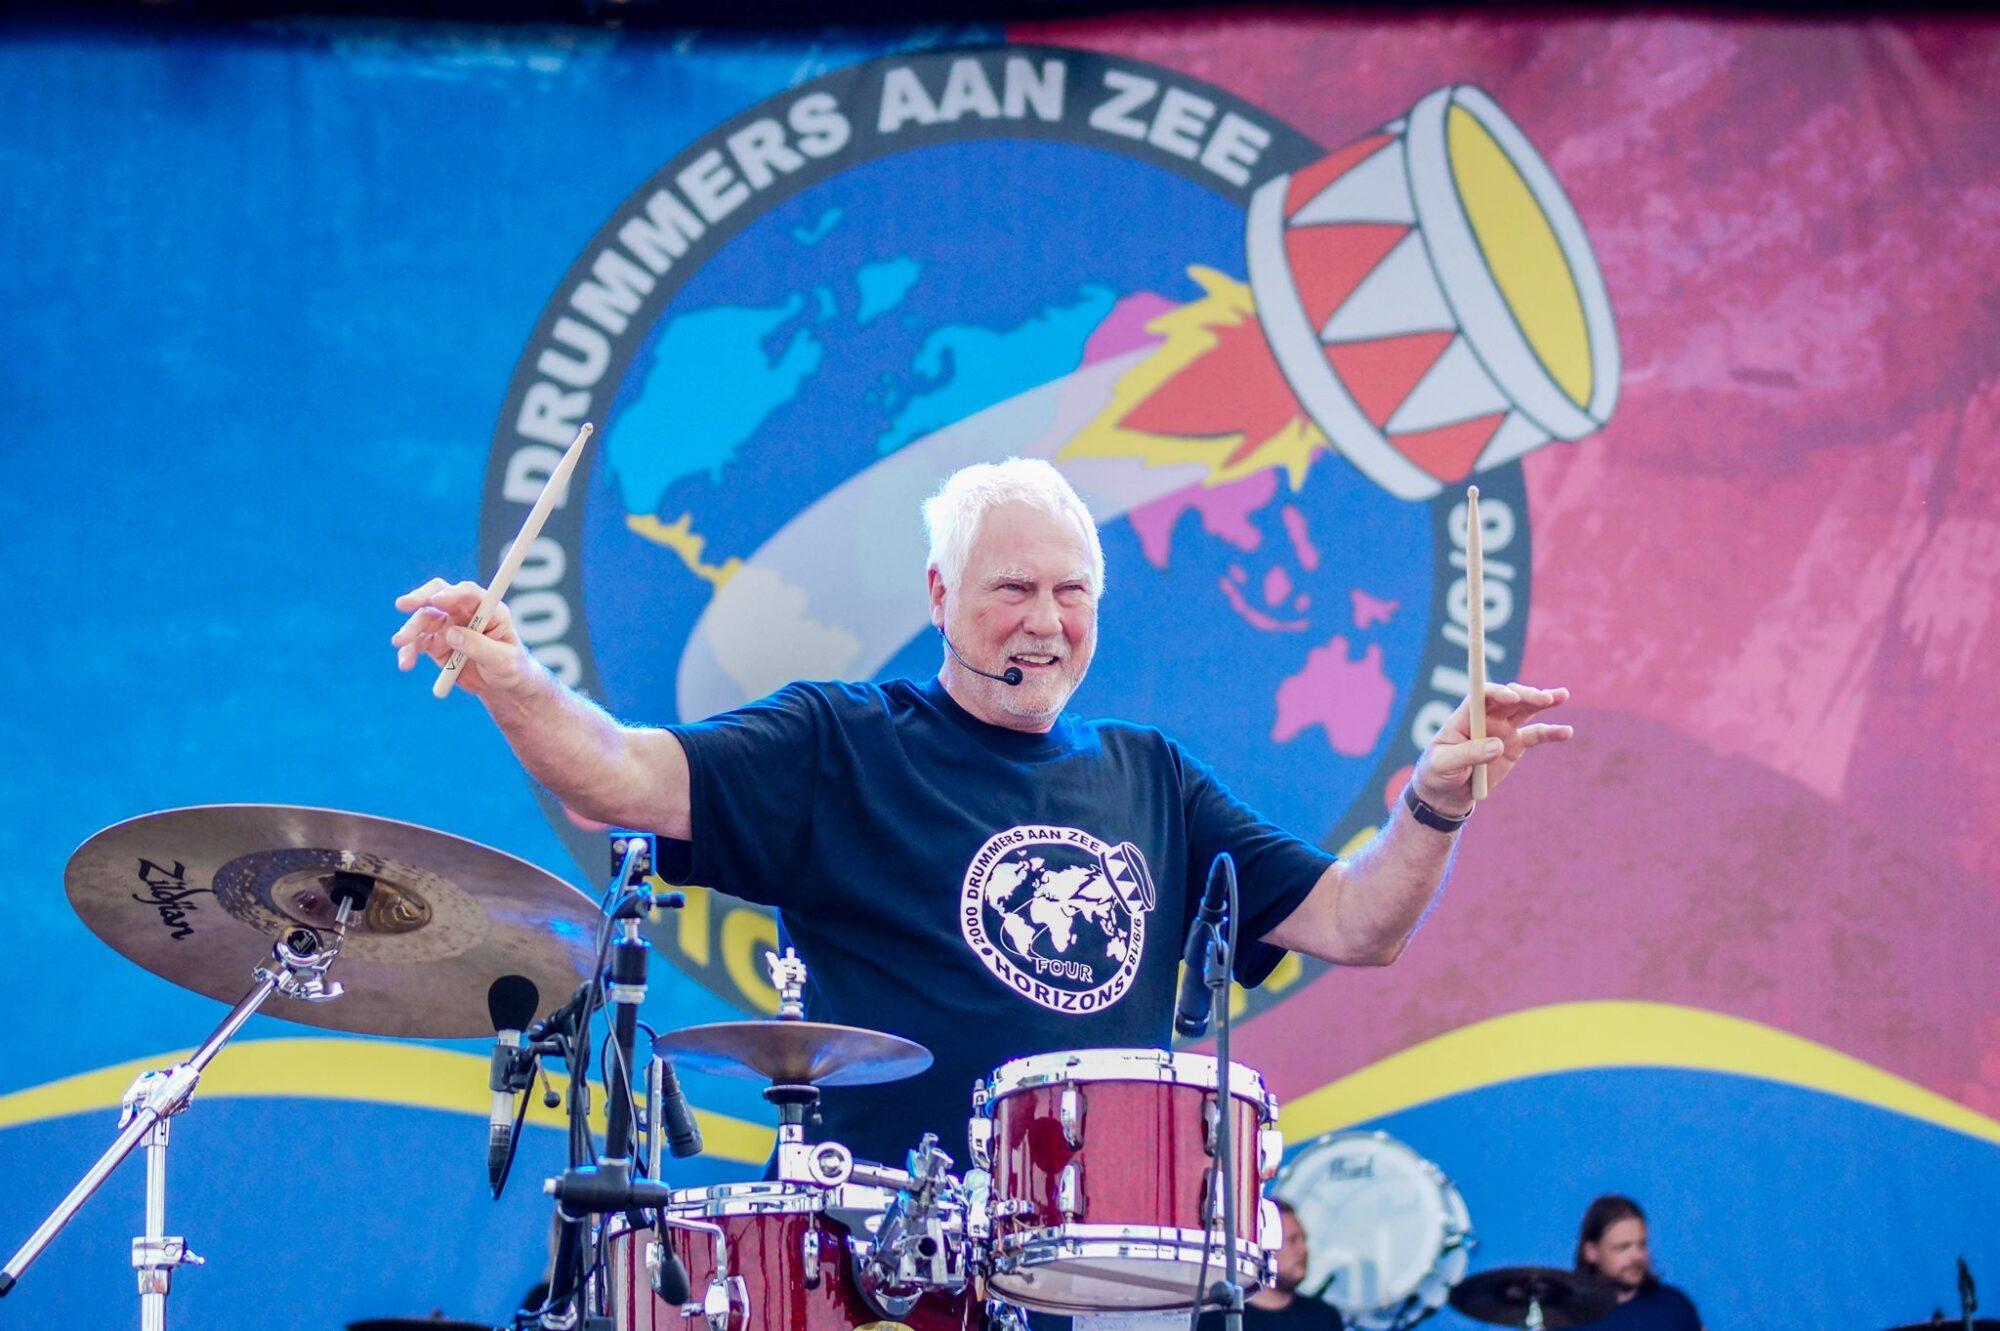 Beste drummers vieren jubileum